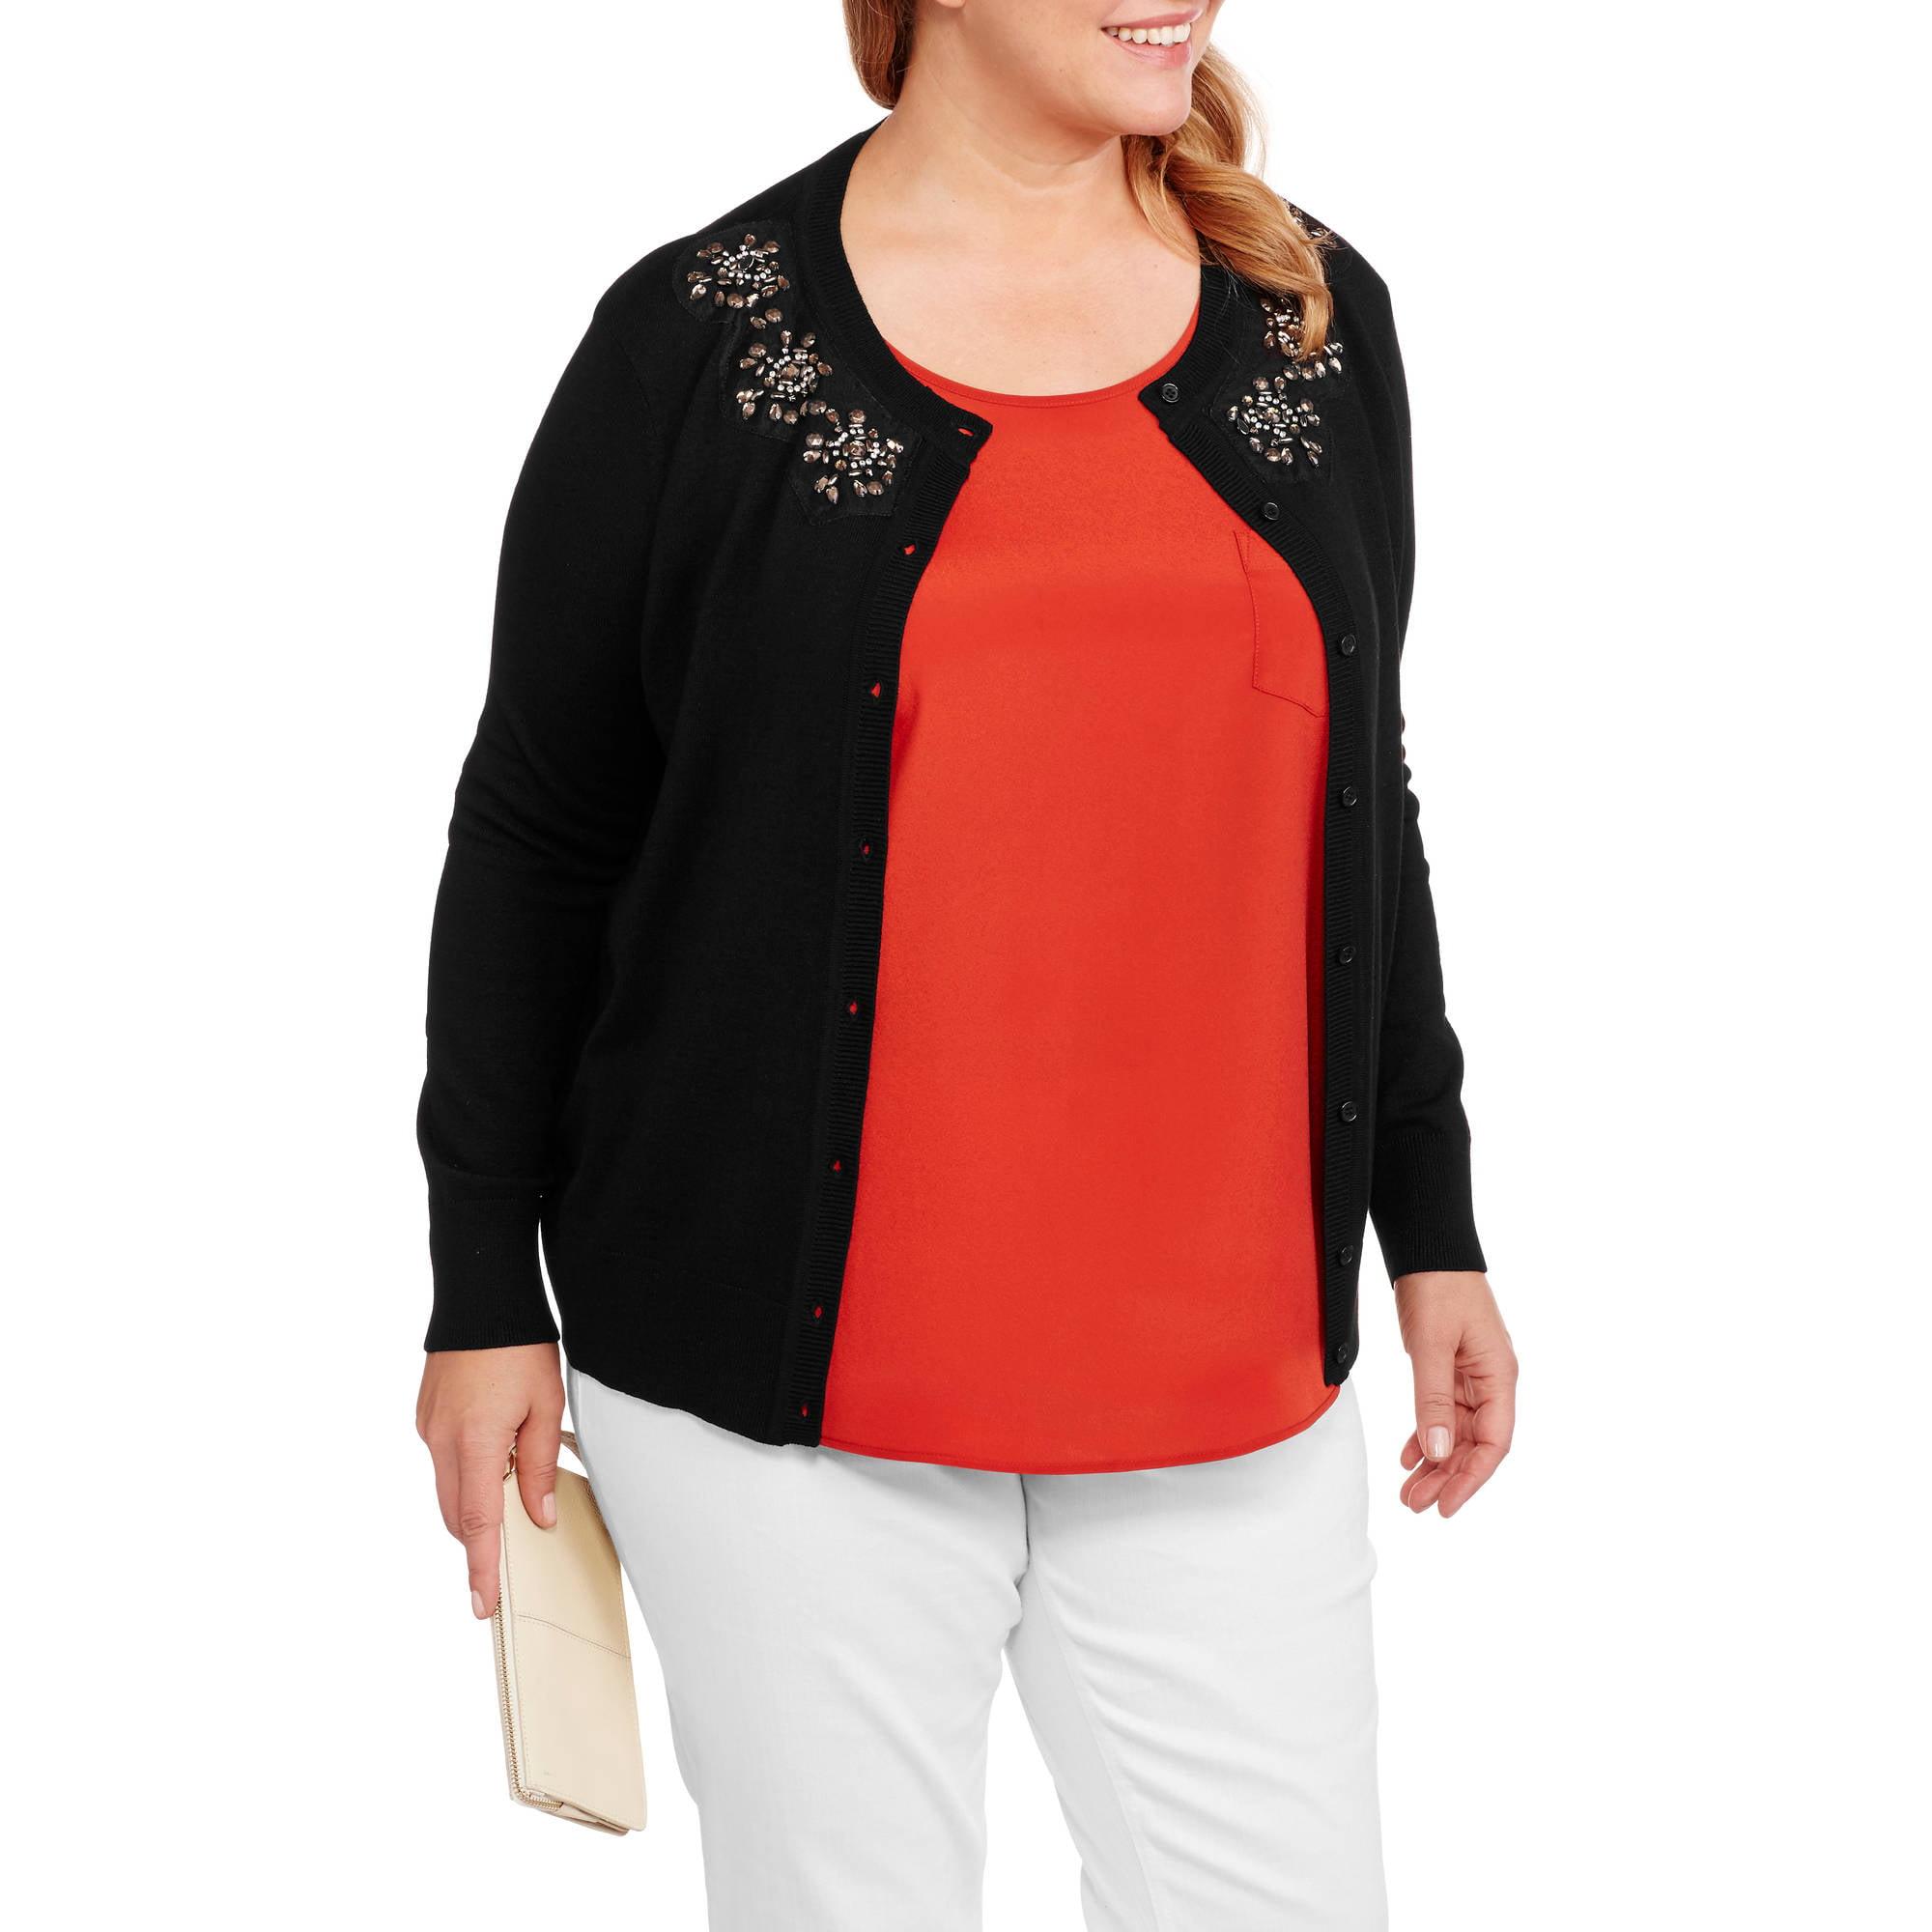 Heart and Crush Women's Plus Jewel Collar Cardigan Sweater